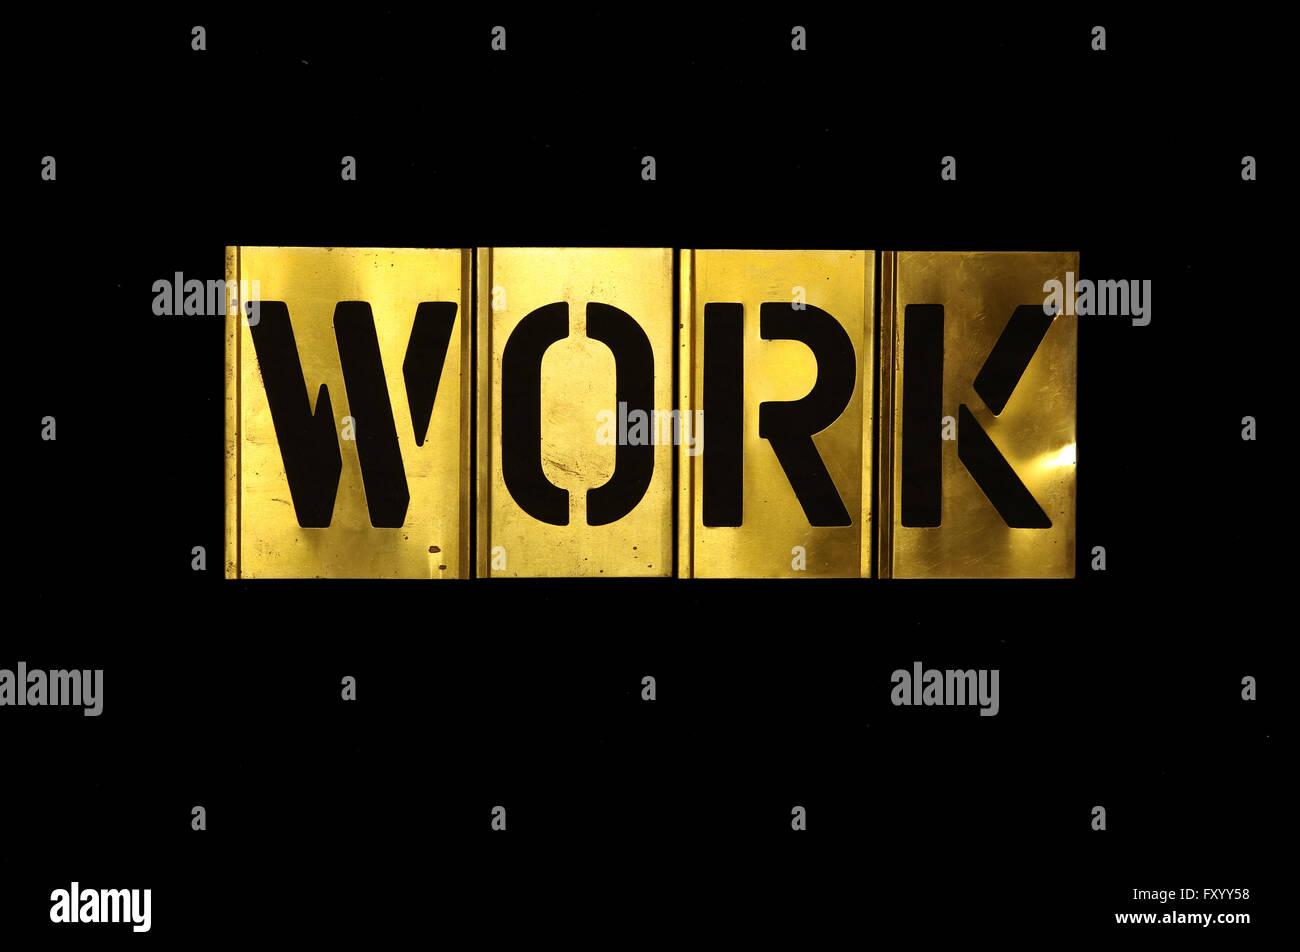 Stencil Military Stencil Work - Stock Image